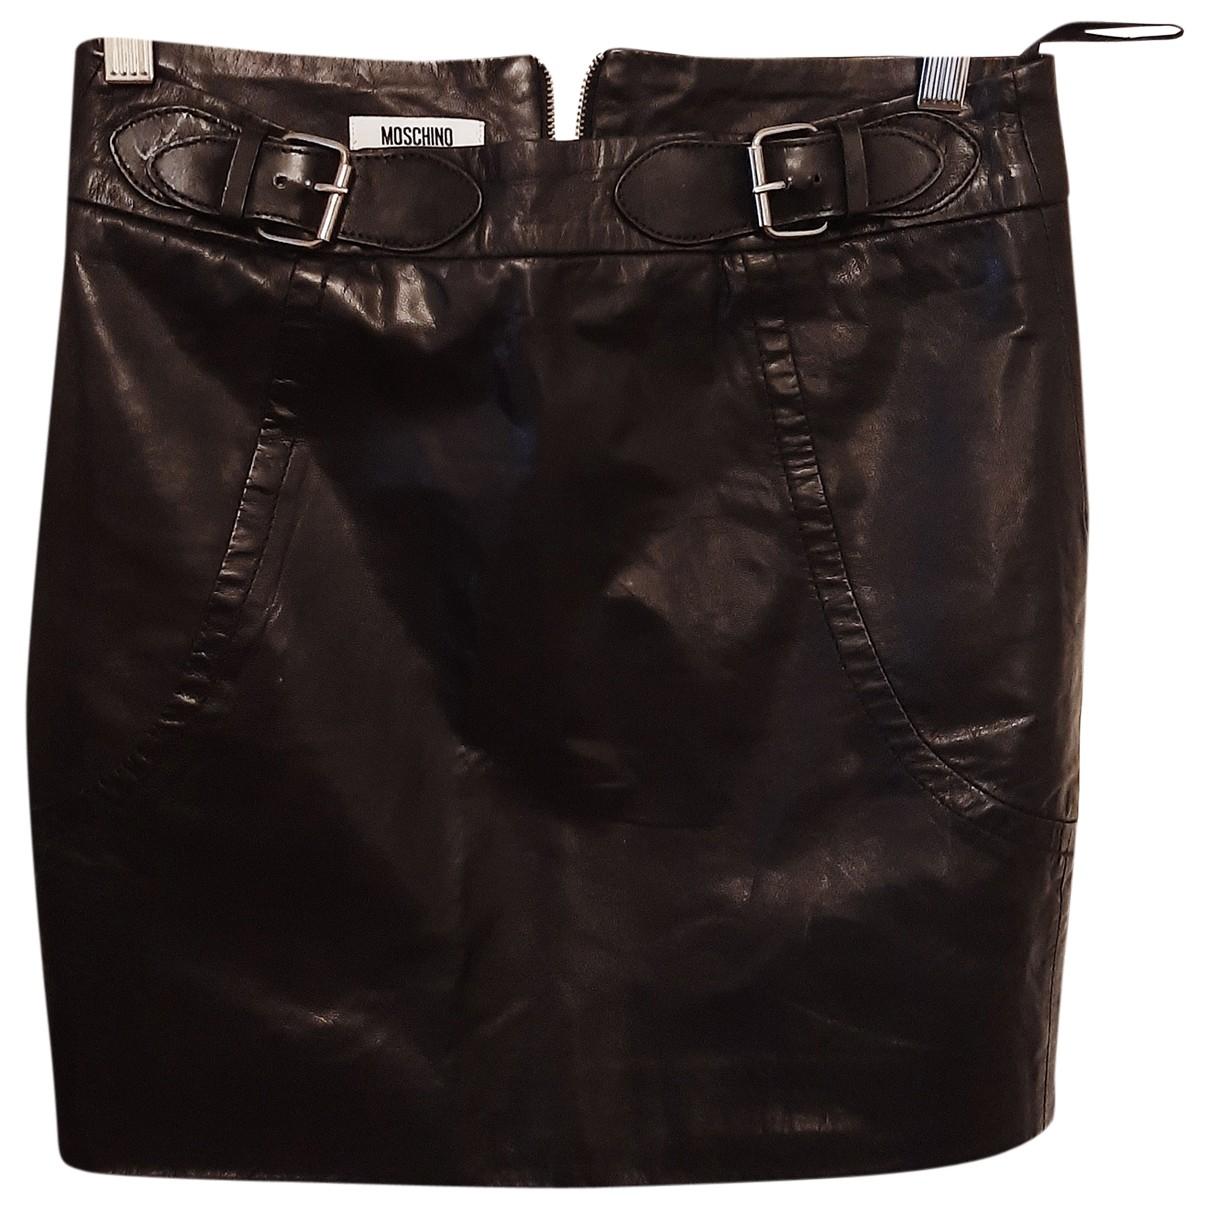 Moschino Cheap And Chic - Jupe   pour femme en cuir - noir